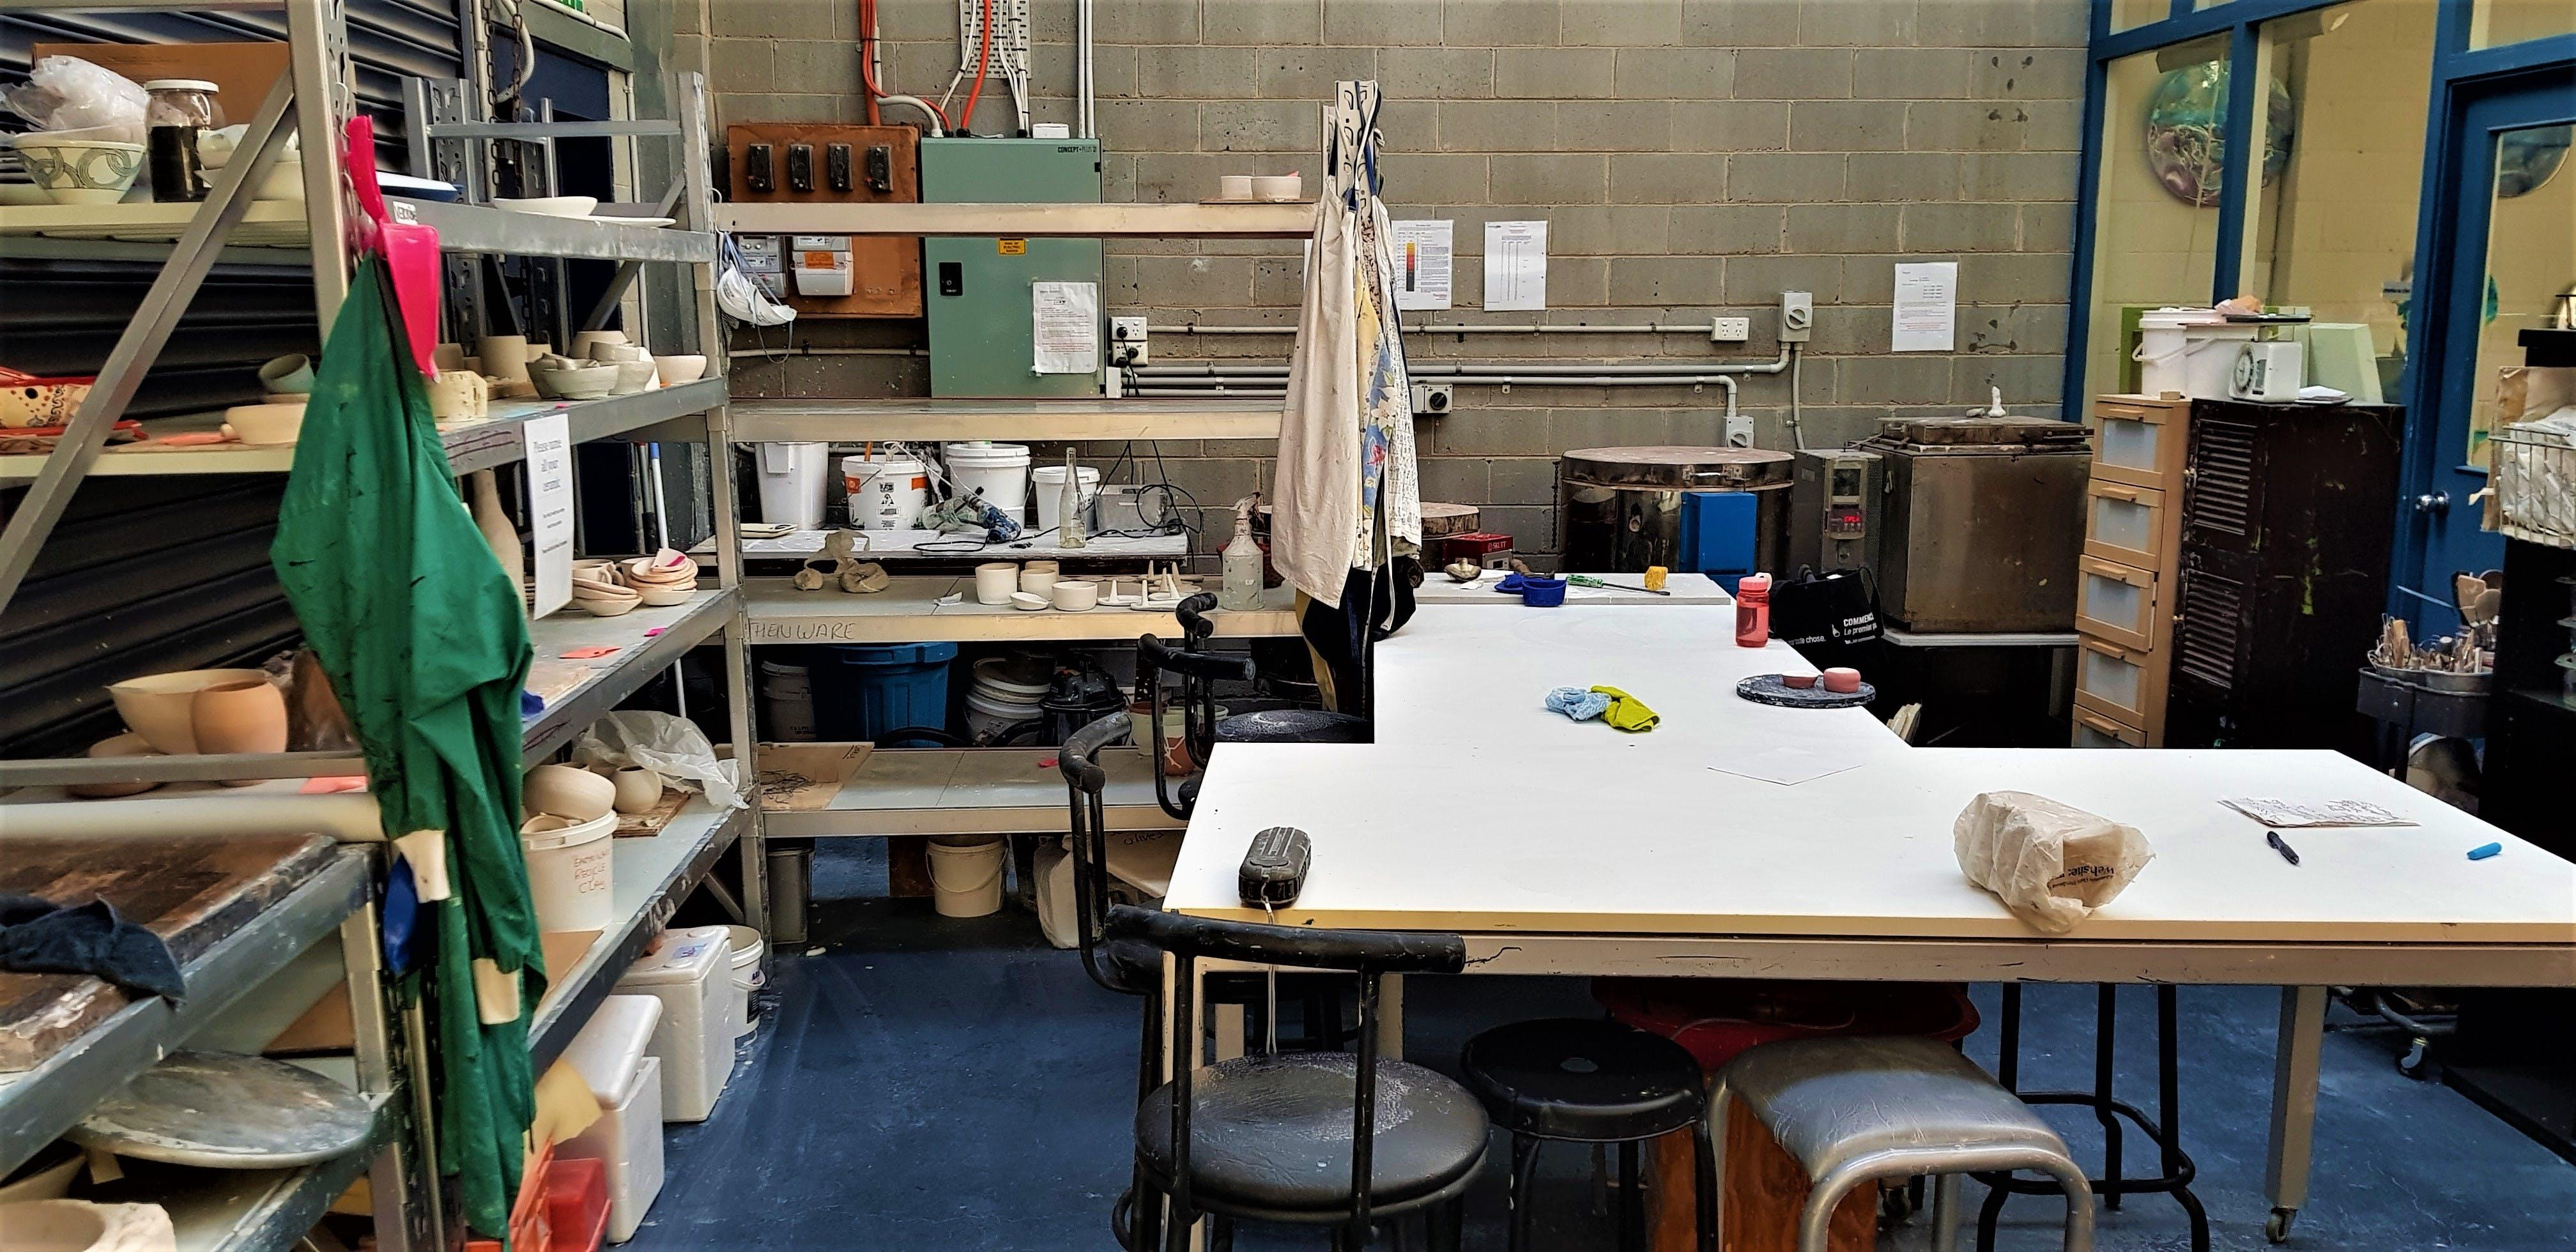 Ceramic studio complete with potter's wheel based in Mordialloc, image 1